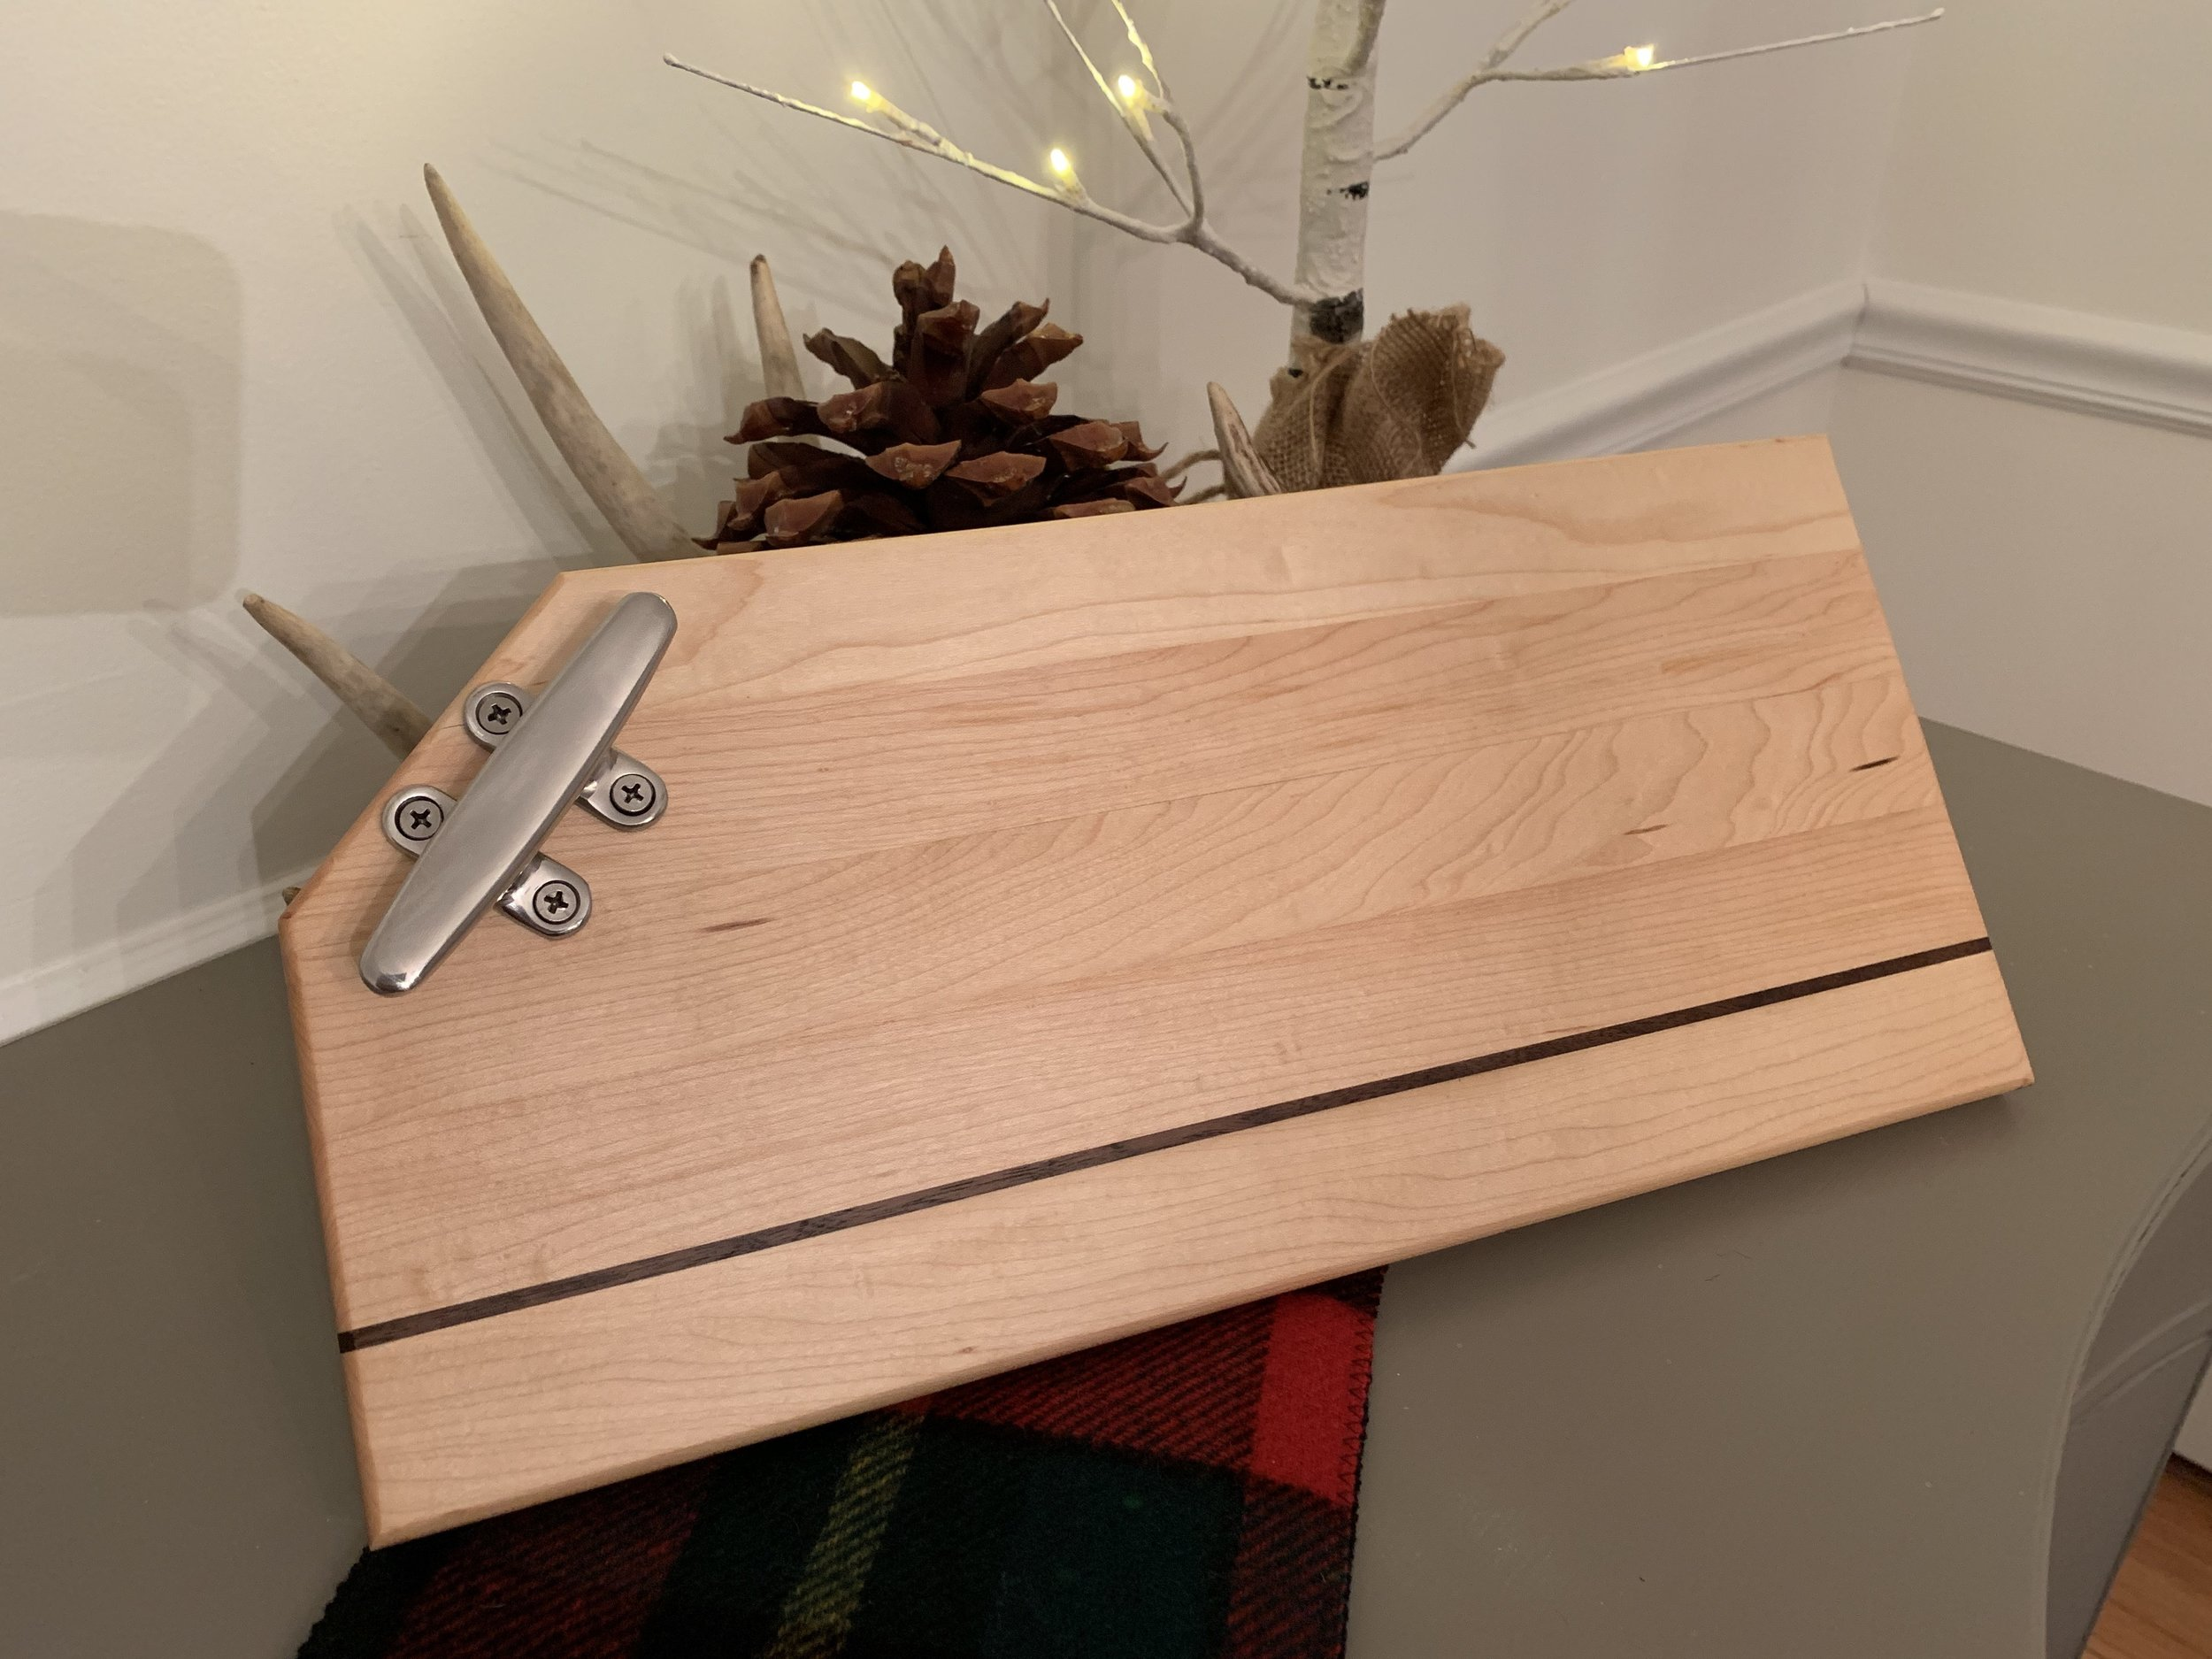 Nautical Theme Maple Cutting Board (Walnut inlay). Handmade in Madison, Connecticut.